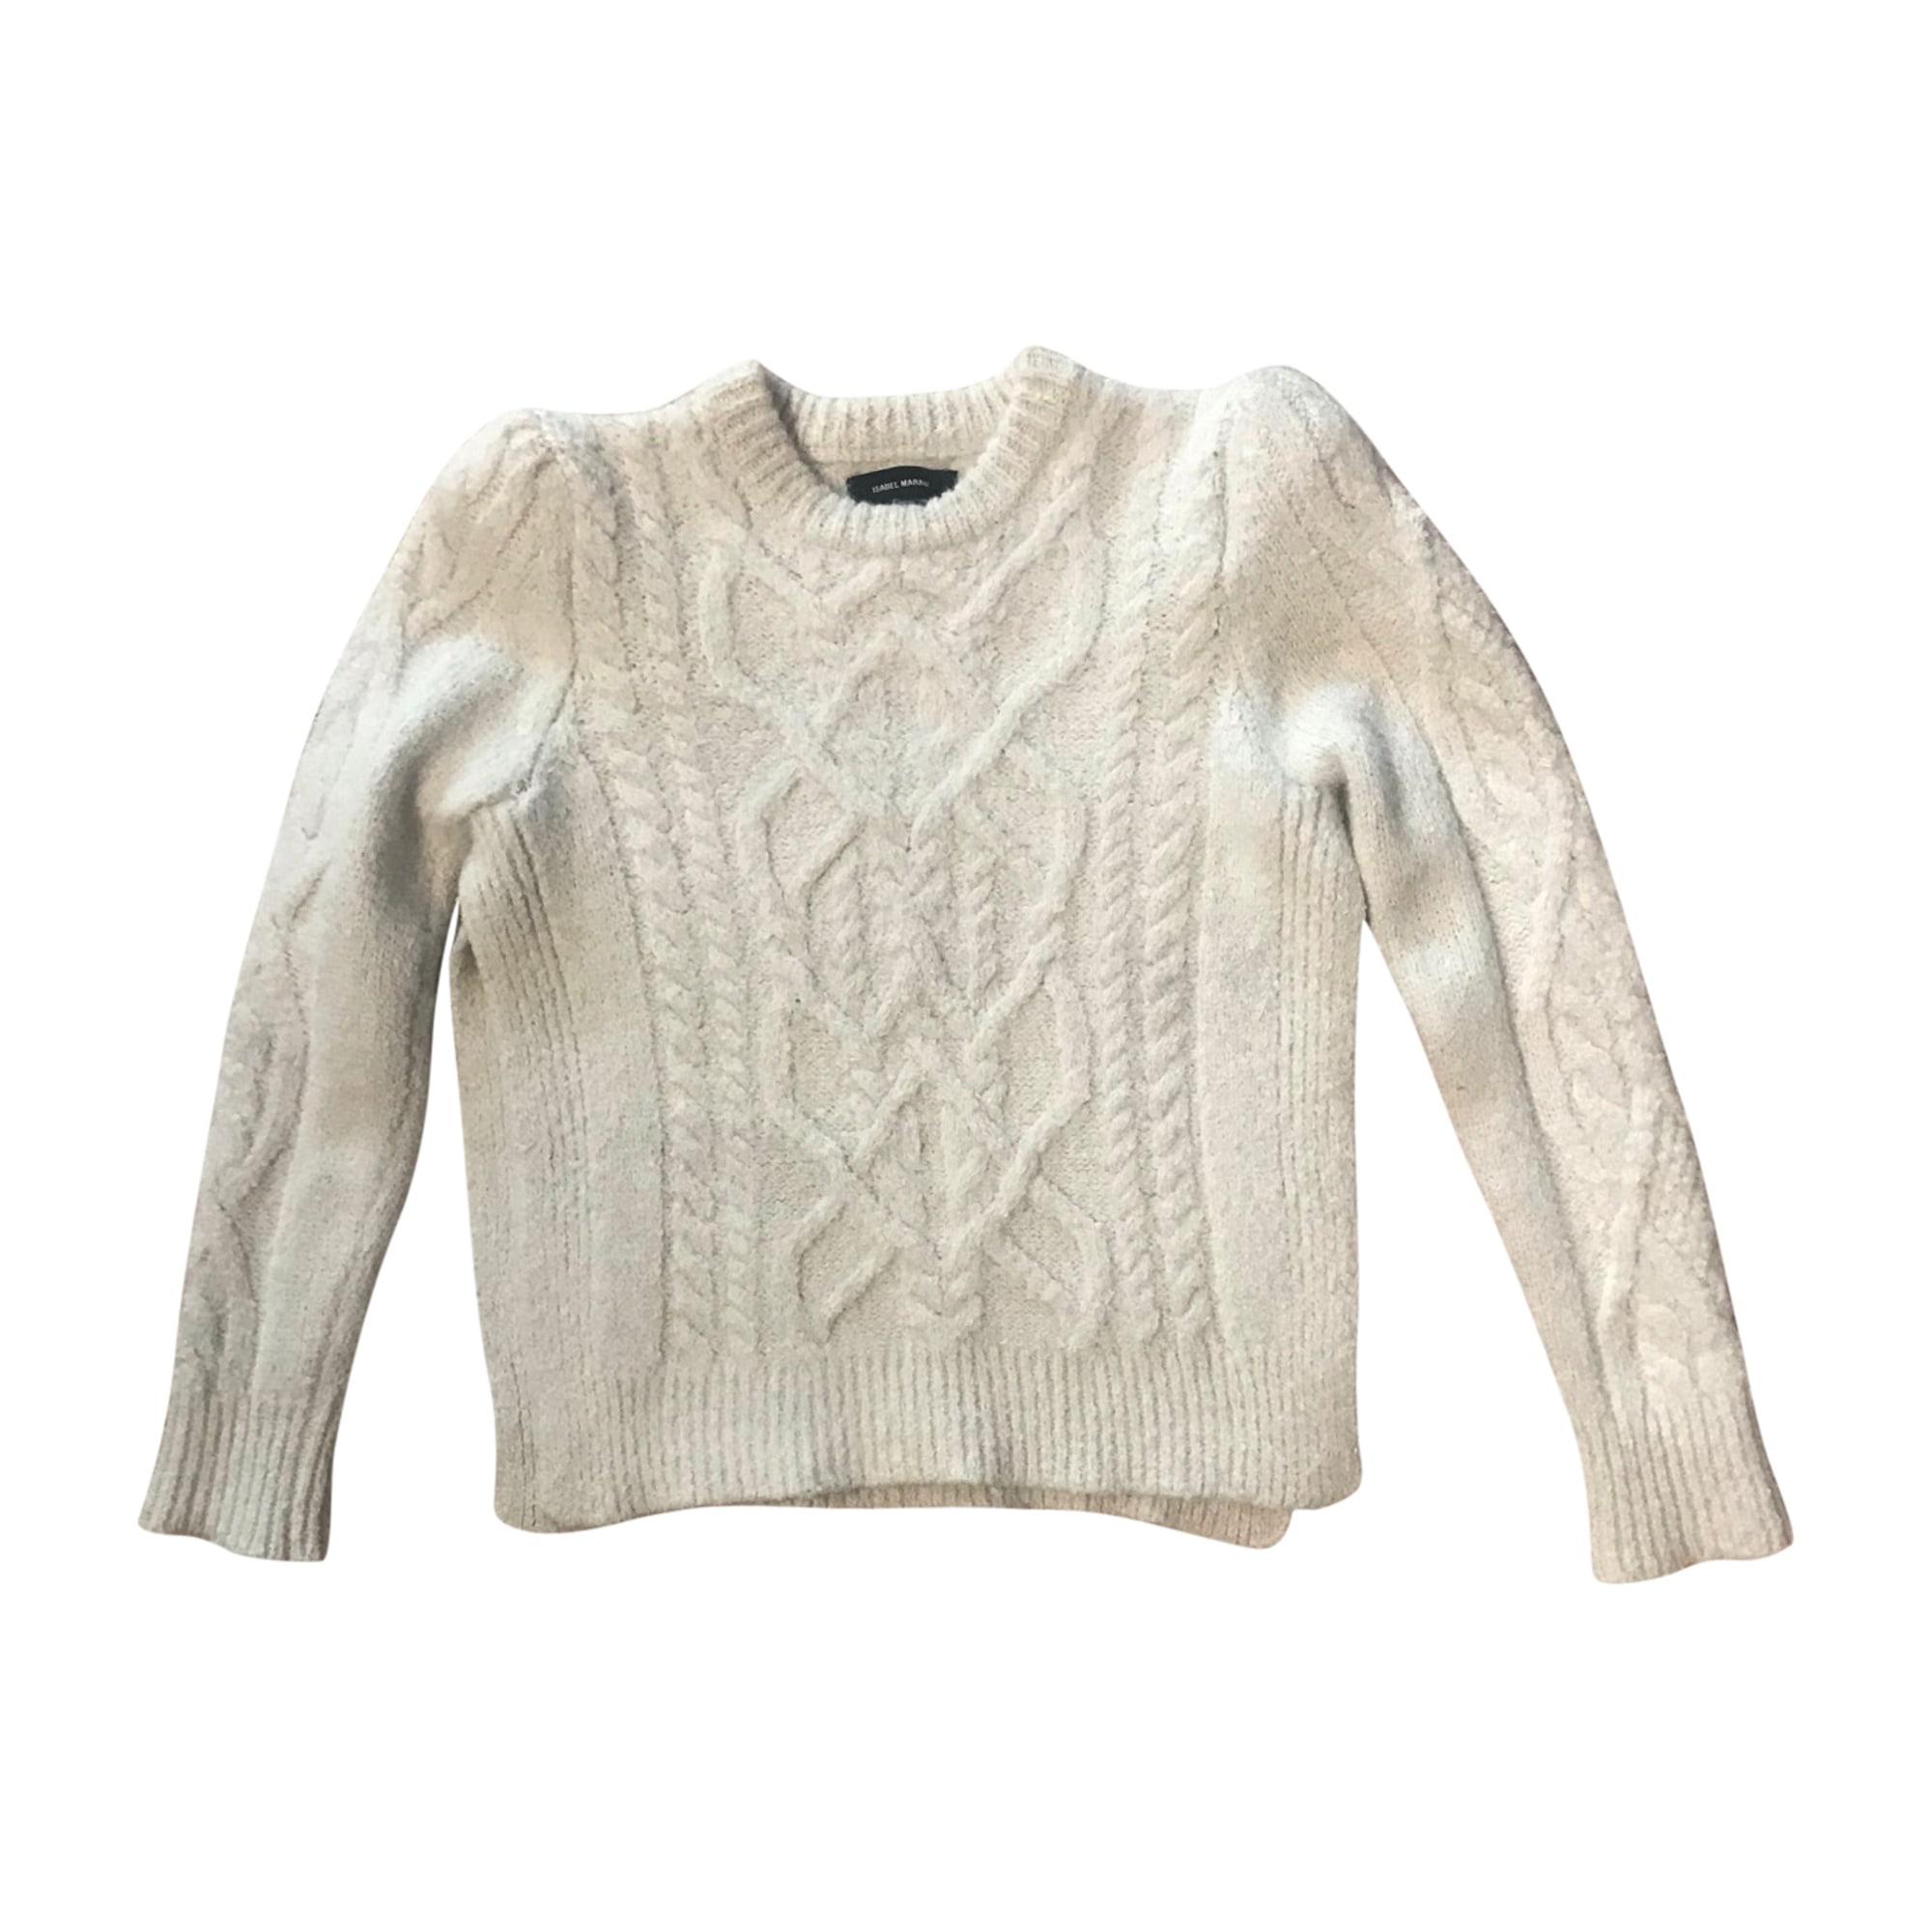 Sweater ISABEL MARANT White, off-white, ecru